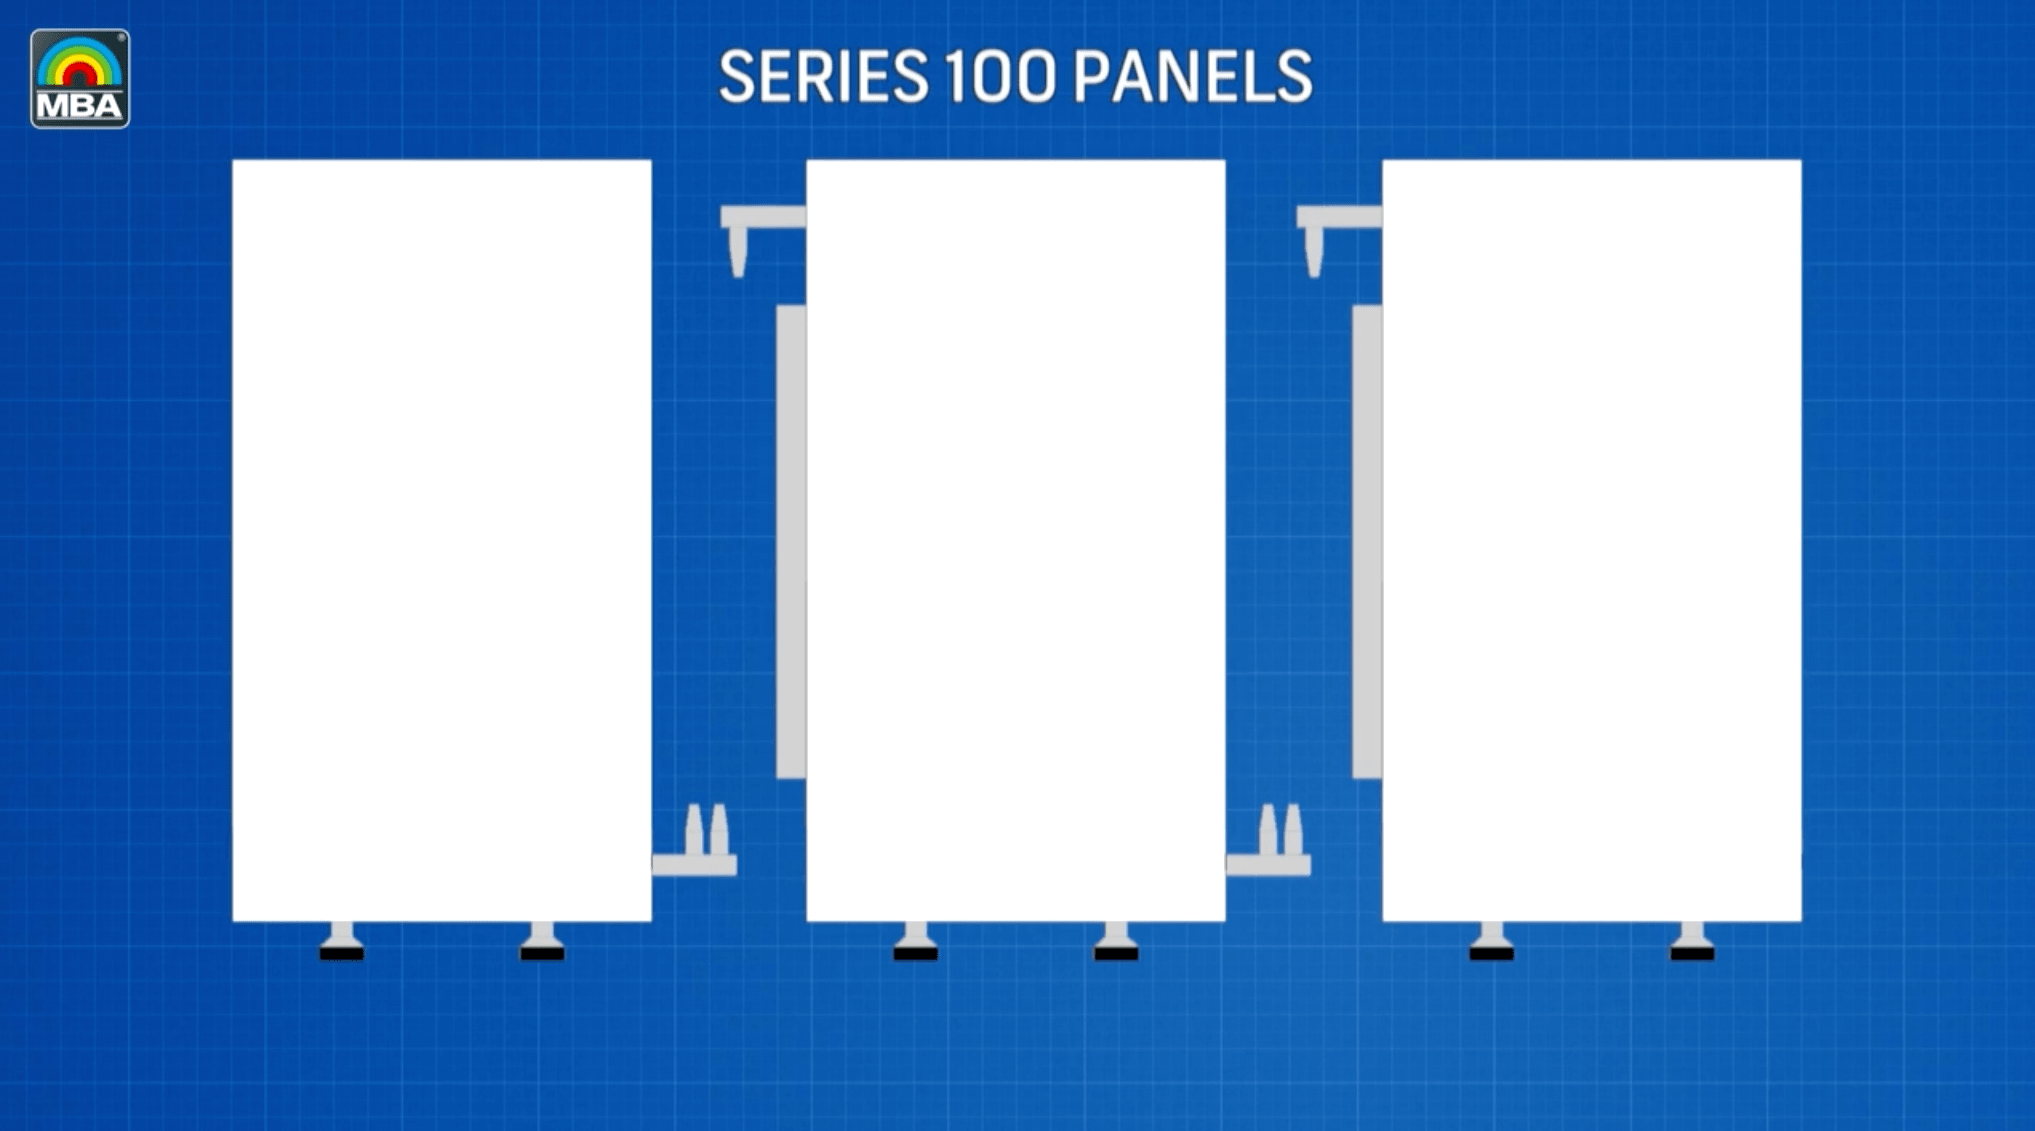 MBA series 100 panels